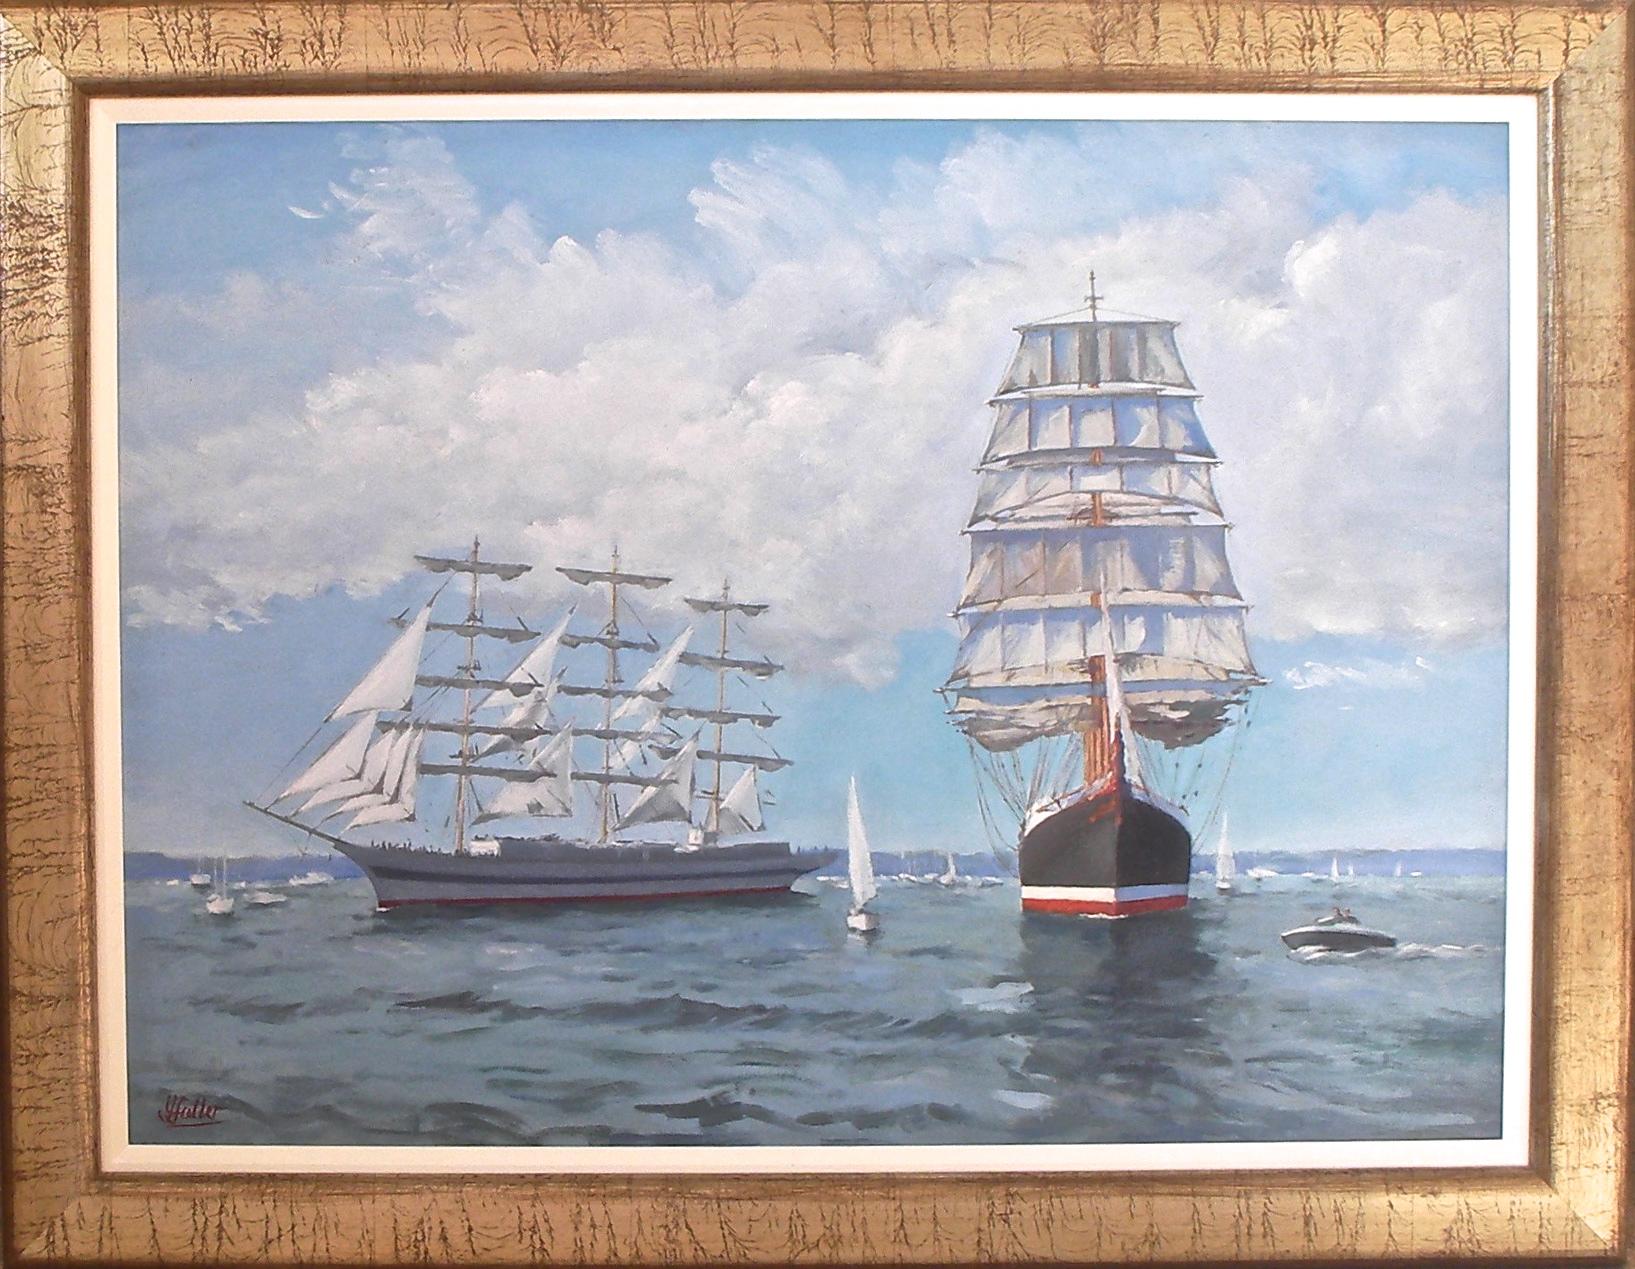 Mir approaching Sedov, Tall Ships' Race, Falmouth 2008